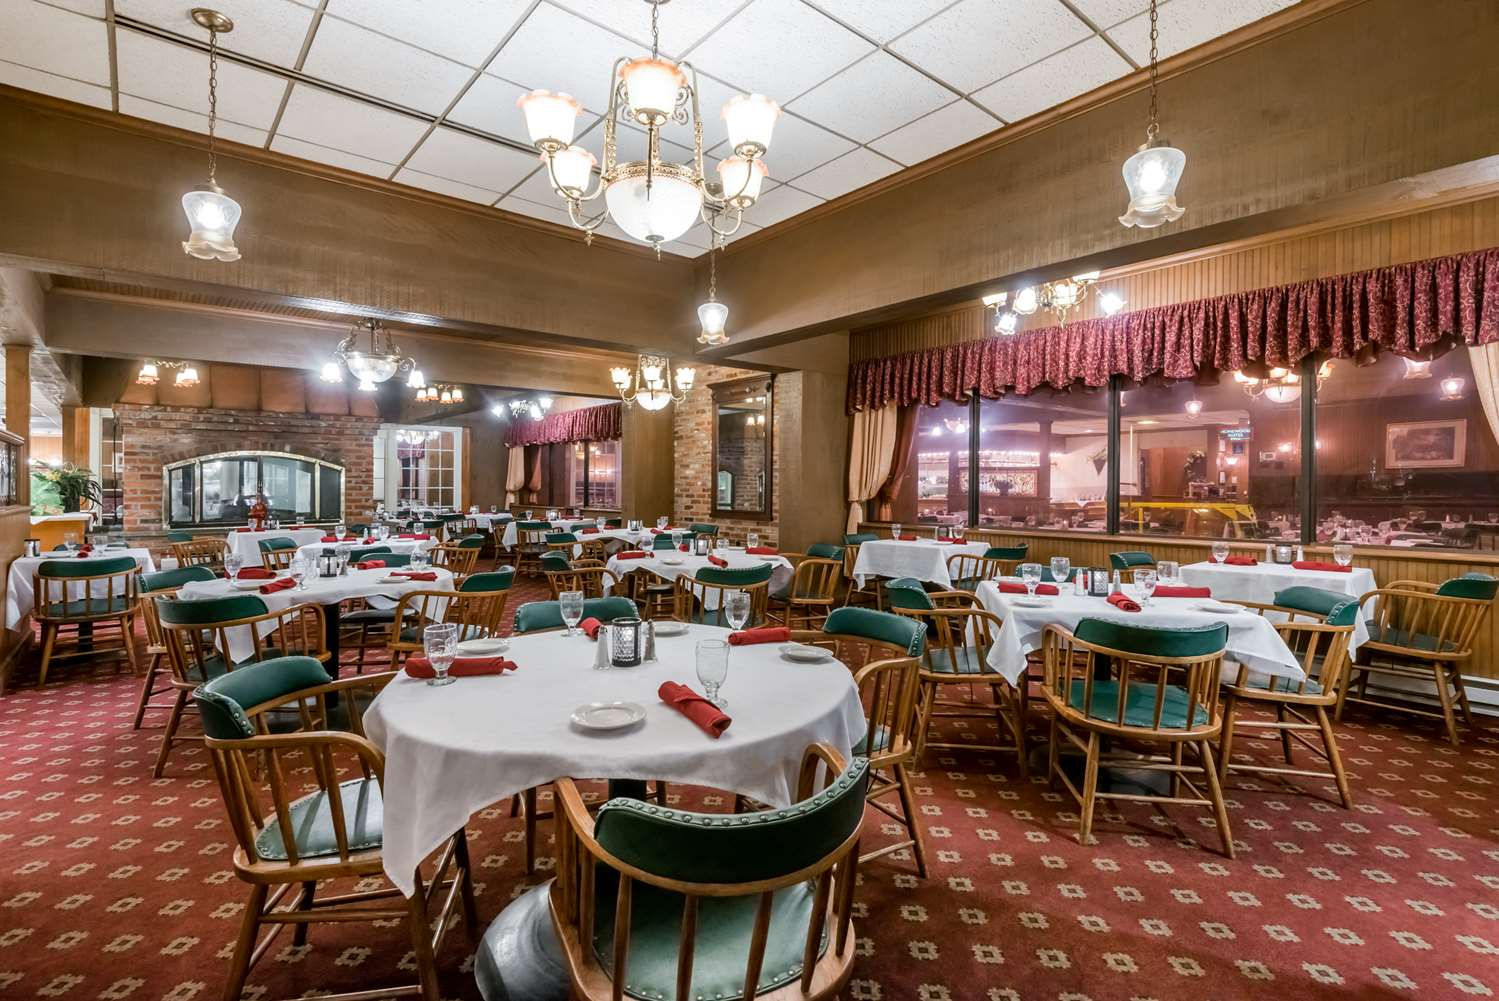 Restaurant - Ramada Plaza Hotel Hagerstown